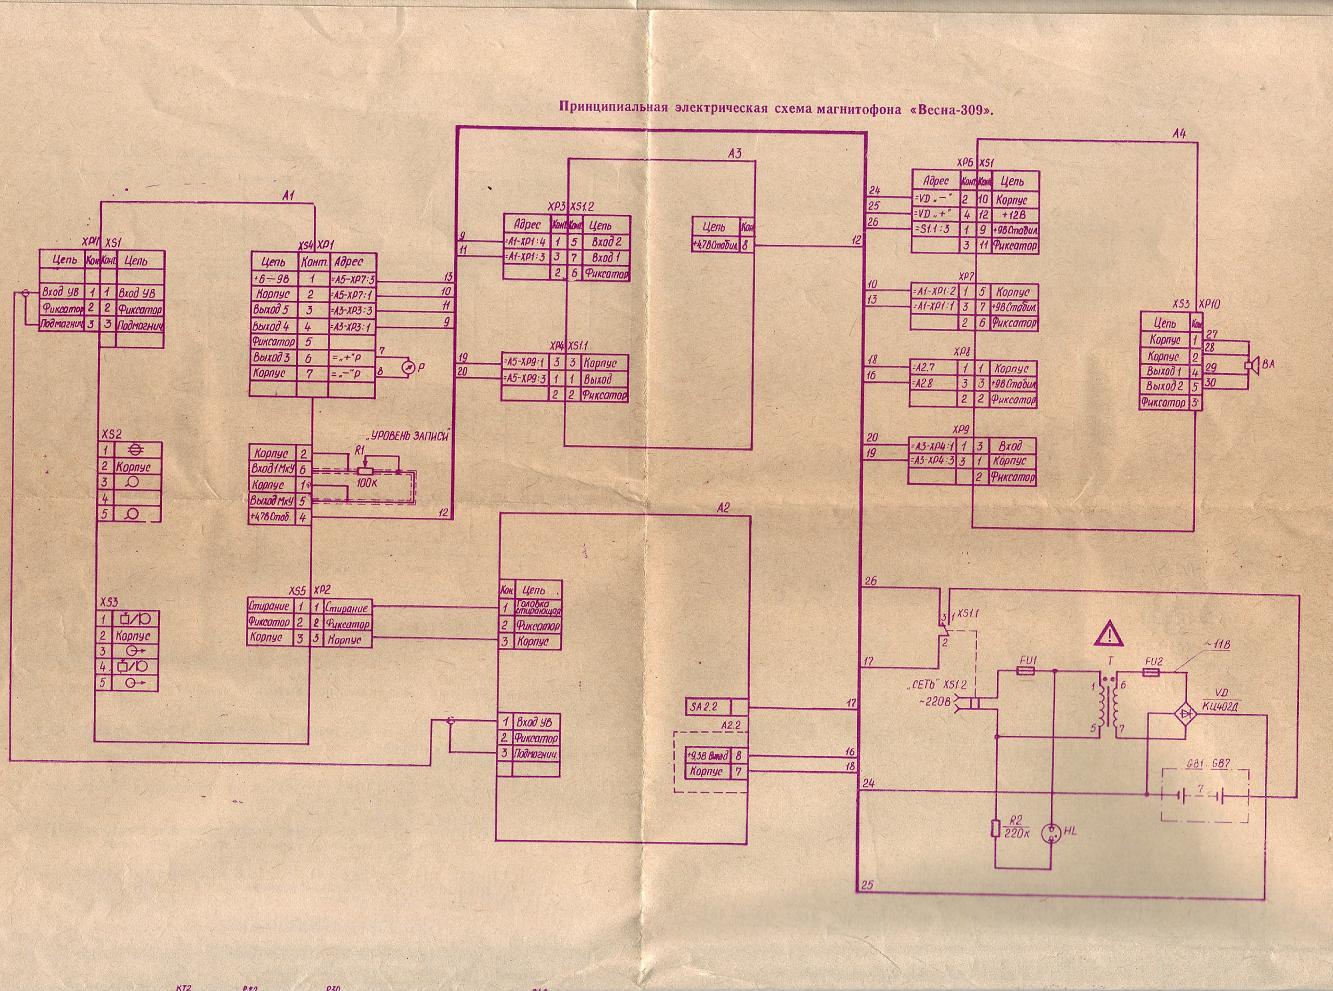 Схема магнитофона электроника мп 204